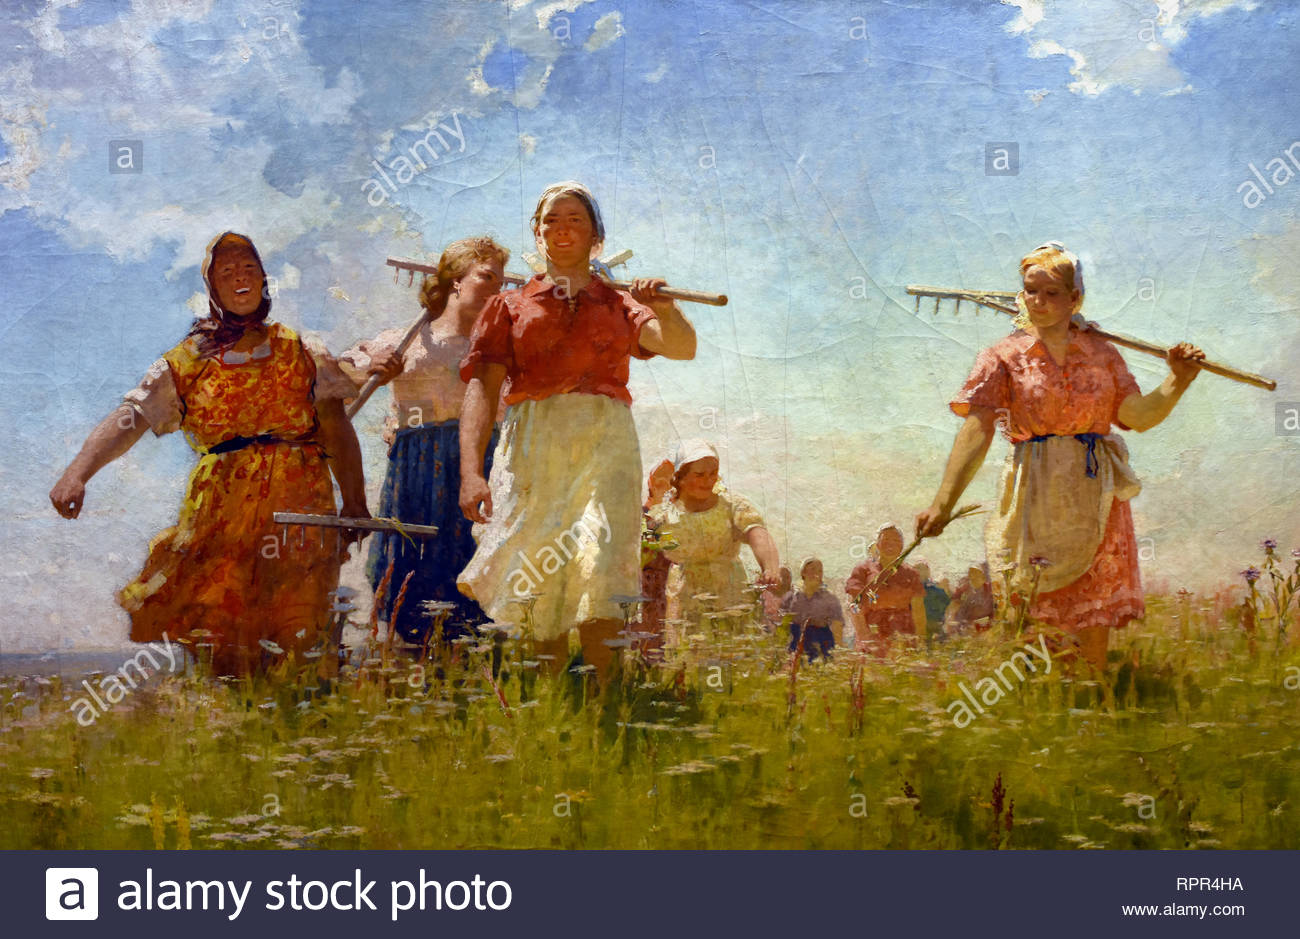 IN THE PEACE CAMPS, 1950 ANDREY MYLNIKOV. Soviet Union Communist Propaganda (Russia under Lenin and Stalin1921-1953 ). - Stock Image